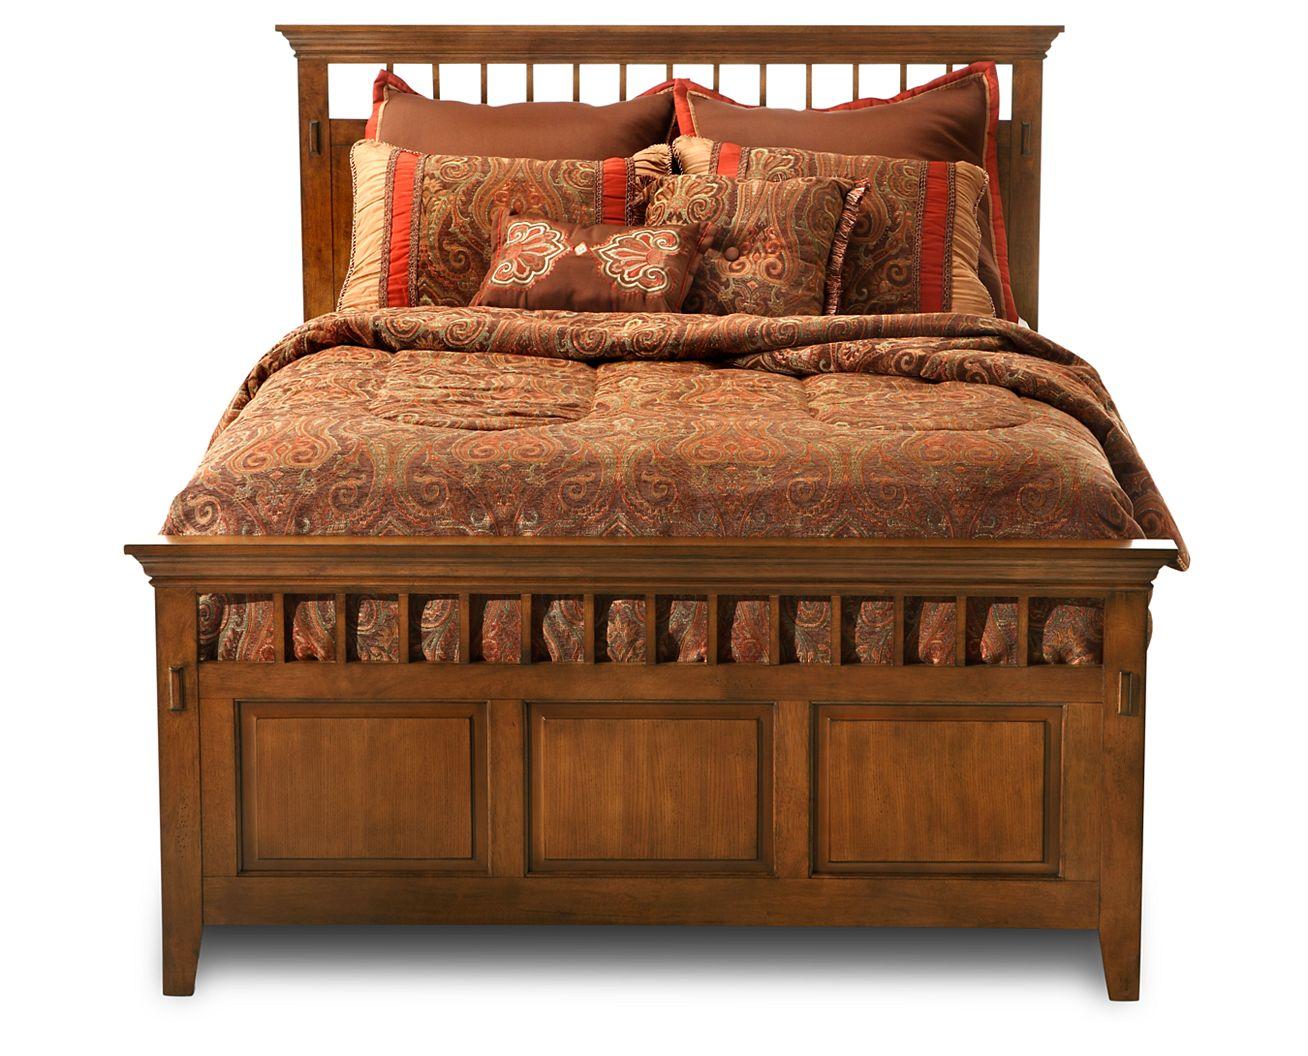 Beautiful Bedroom Furniture, Bedroom Sets   Furniture Row